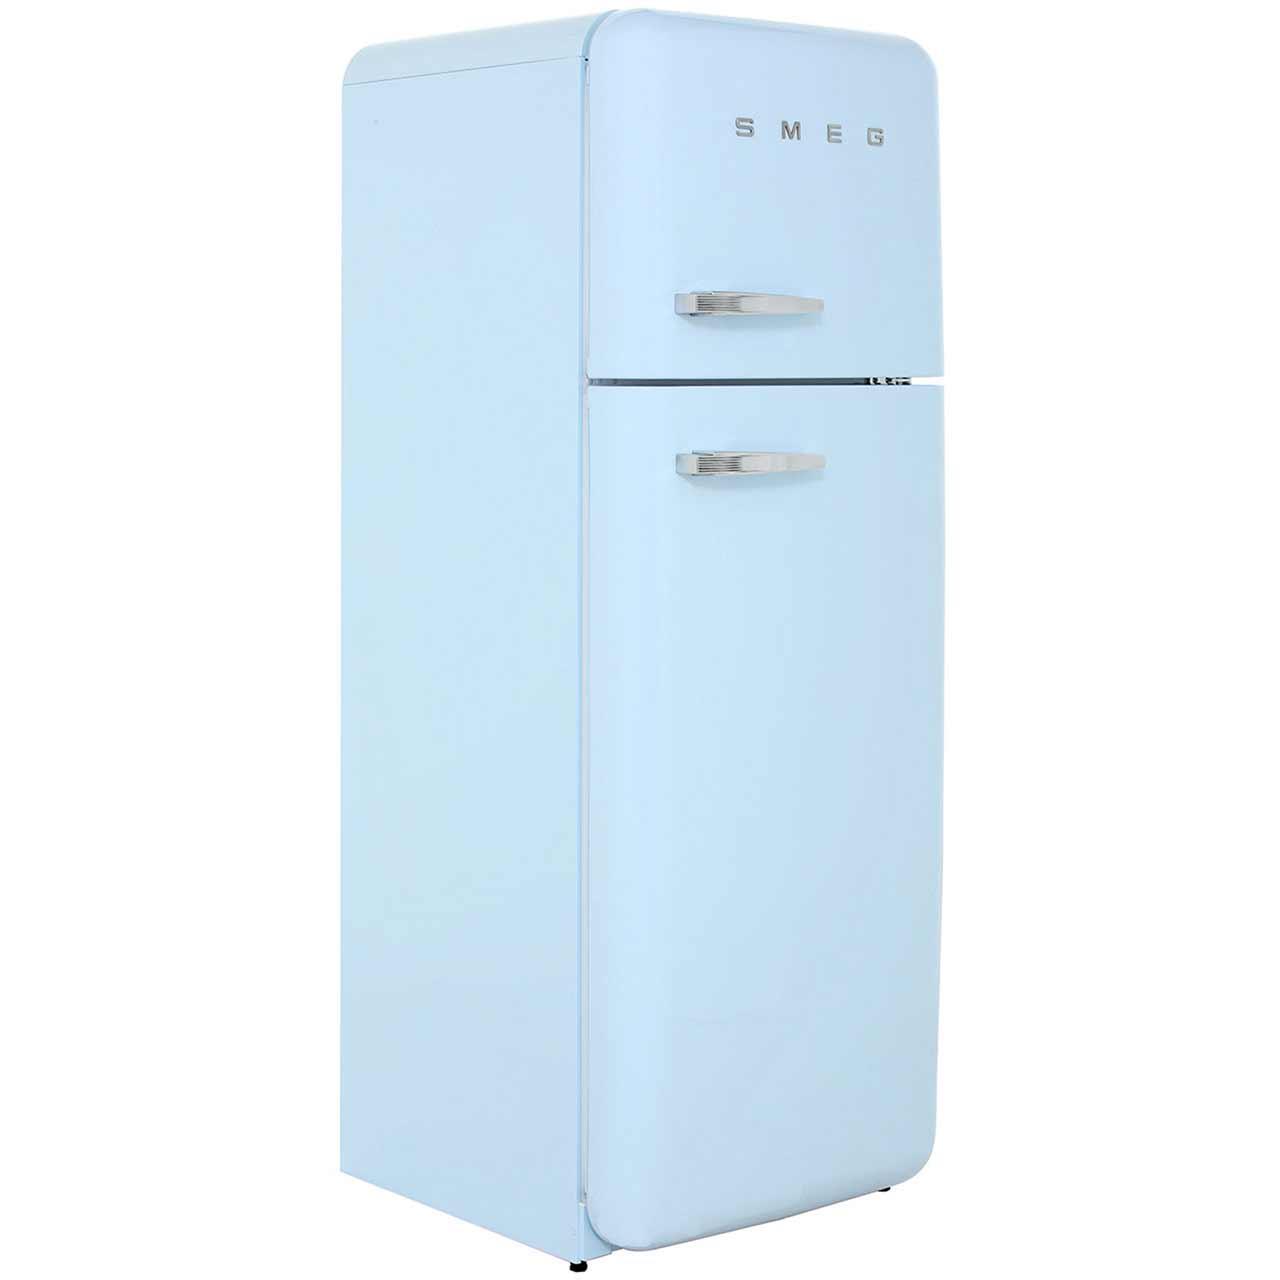 Smeg right hand hinge fab30rfa 70 30 fridge freezer pastel blue - Choosing right freezer ...